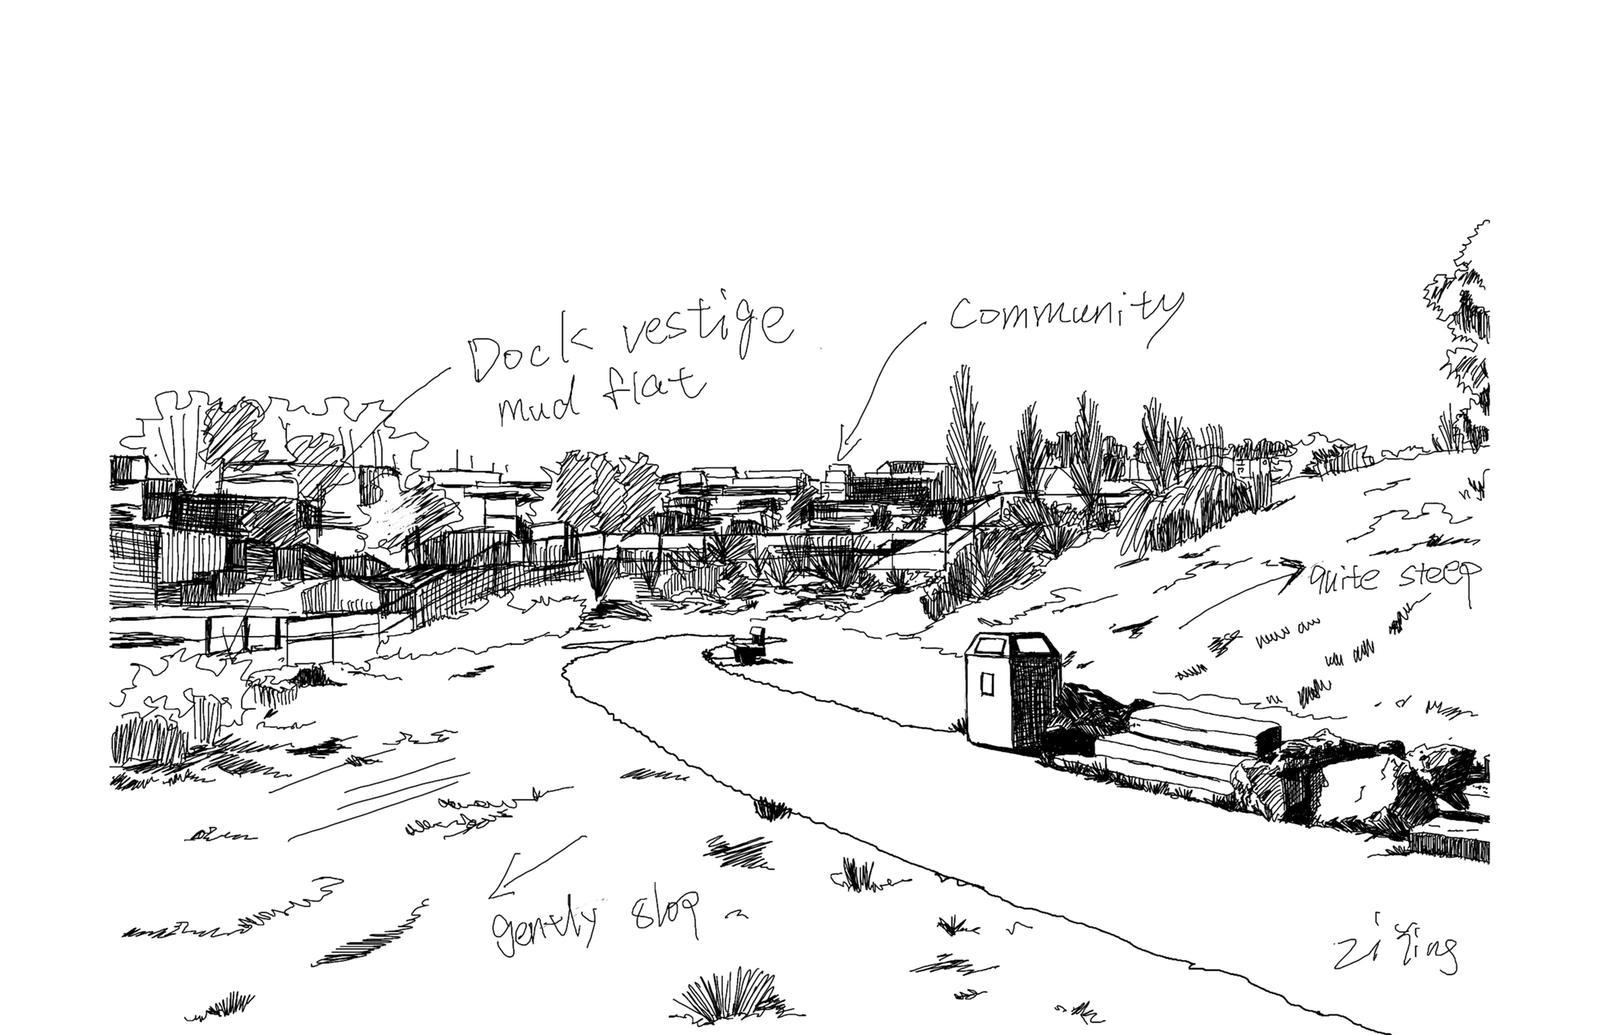 Site Analysis Sketch 6 – India Basin Park, San Francisco